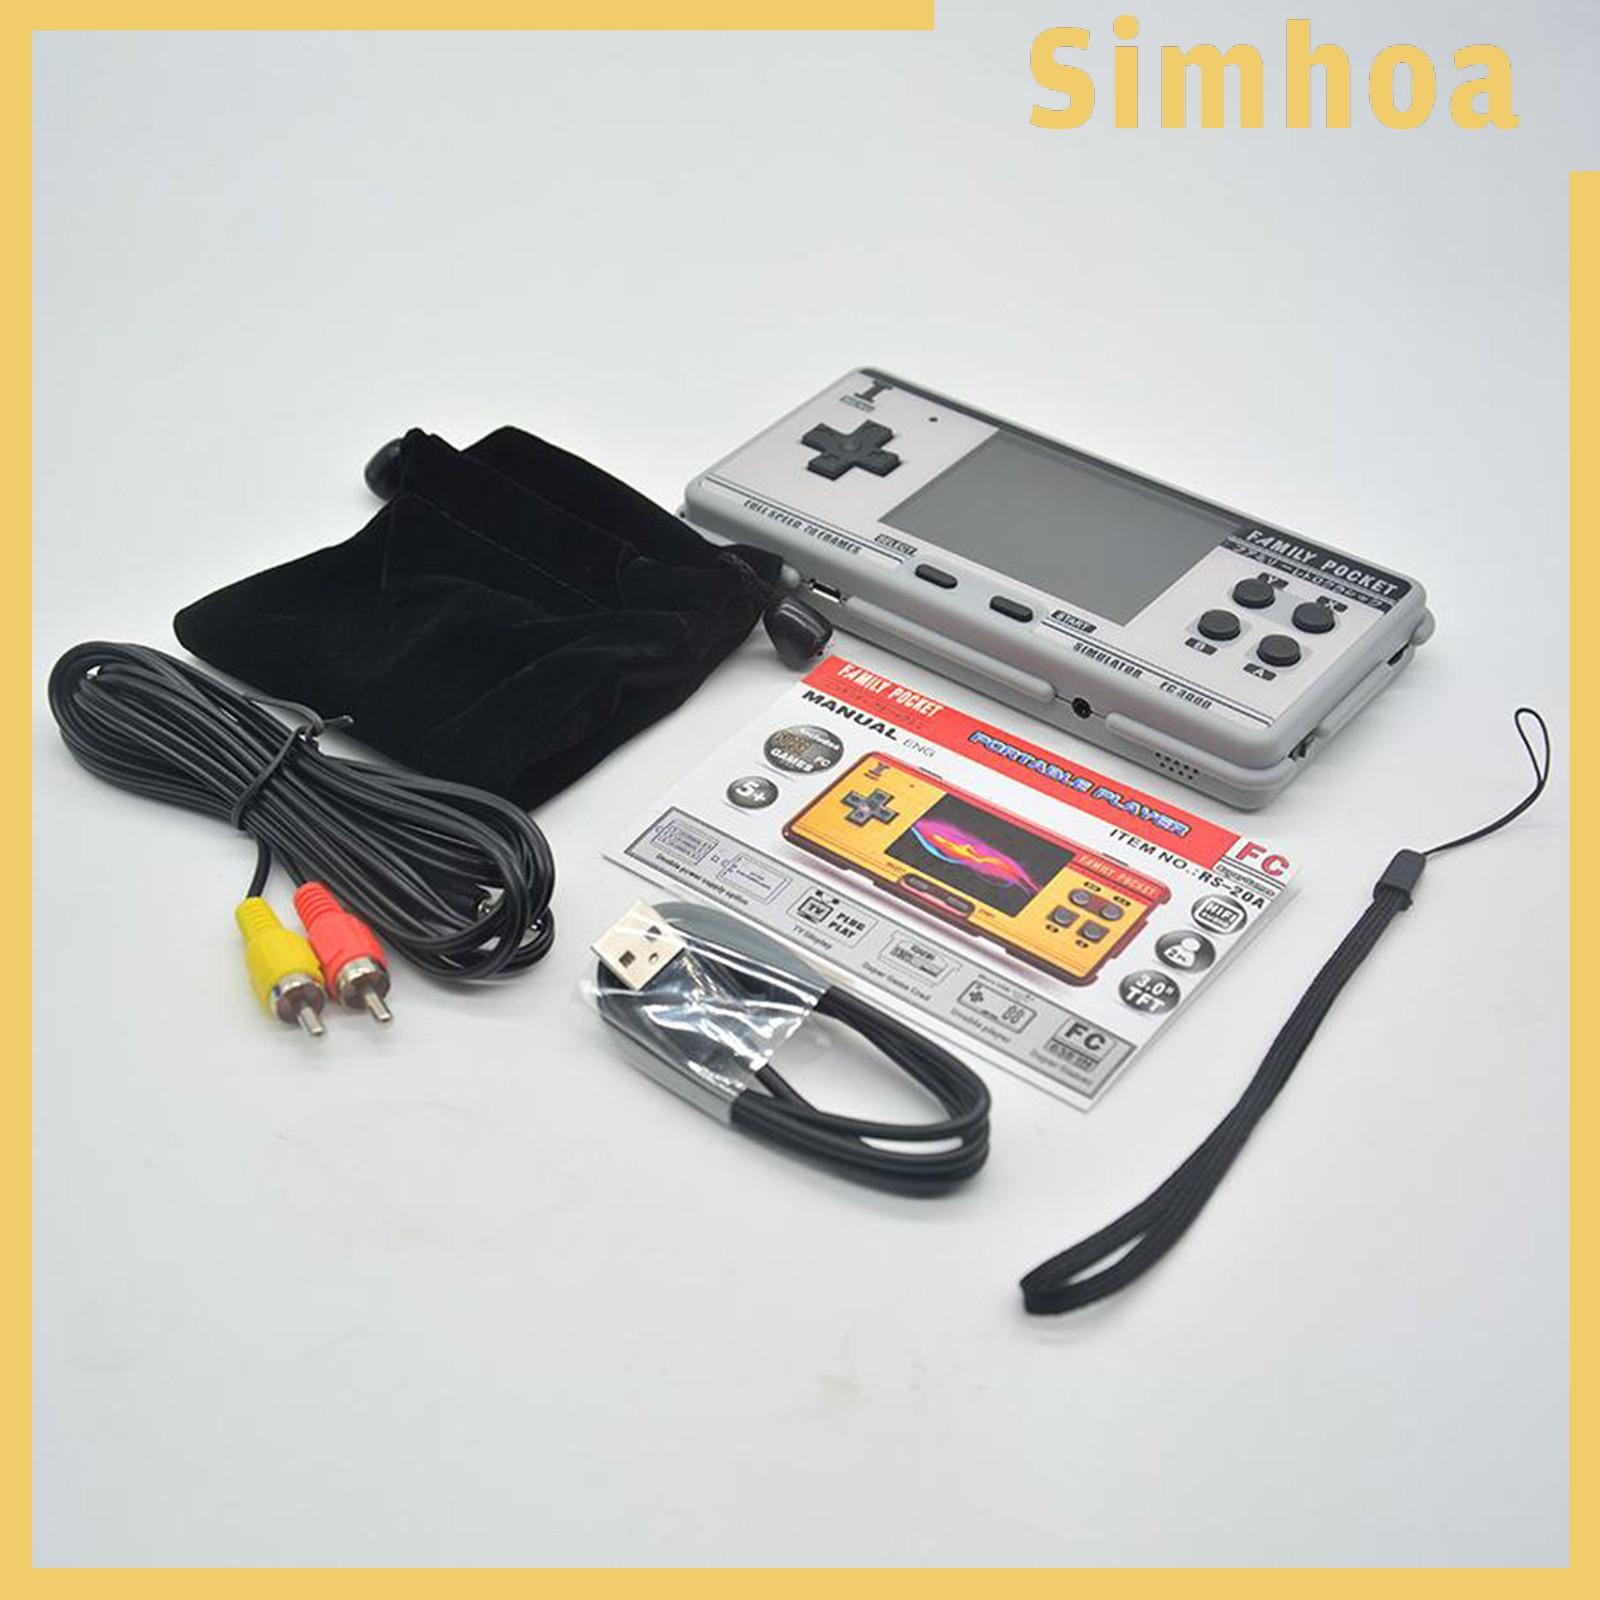 "[Simhoa] Fc3000 掌上游戲機 3\ ""高清屏幕視頻經典遊戲機"